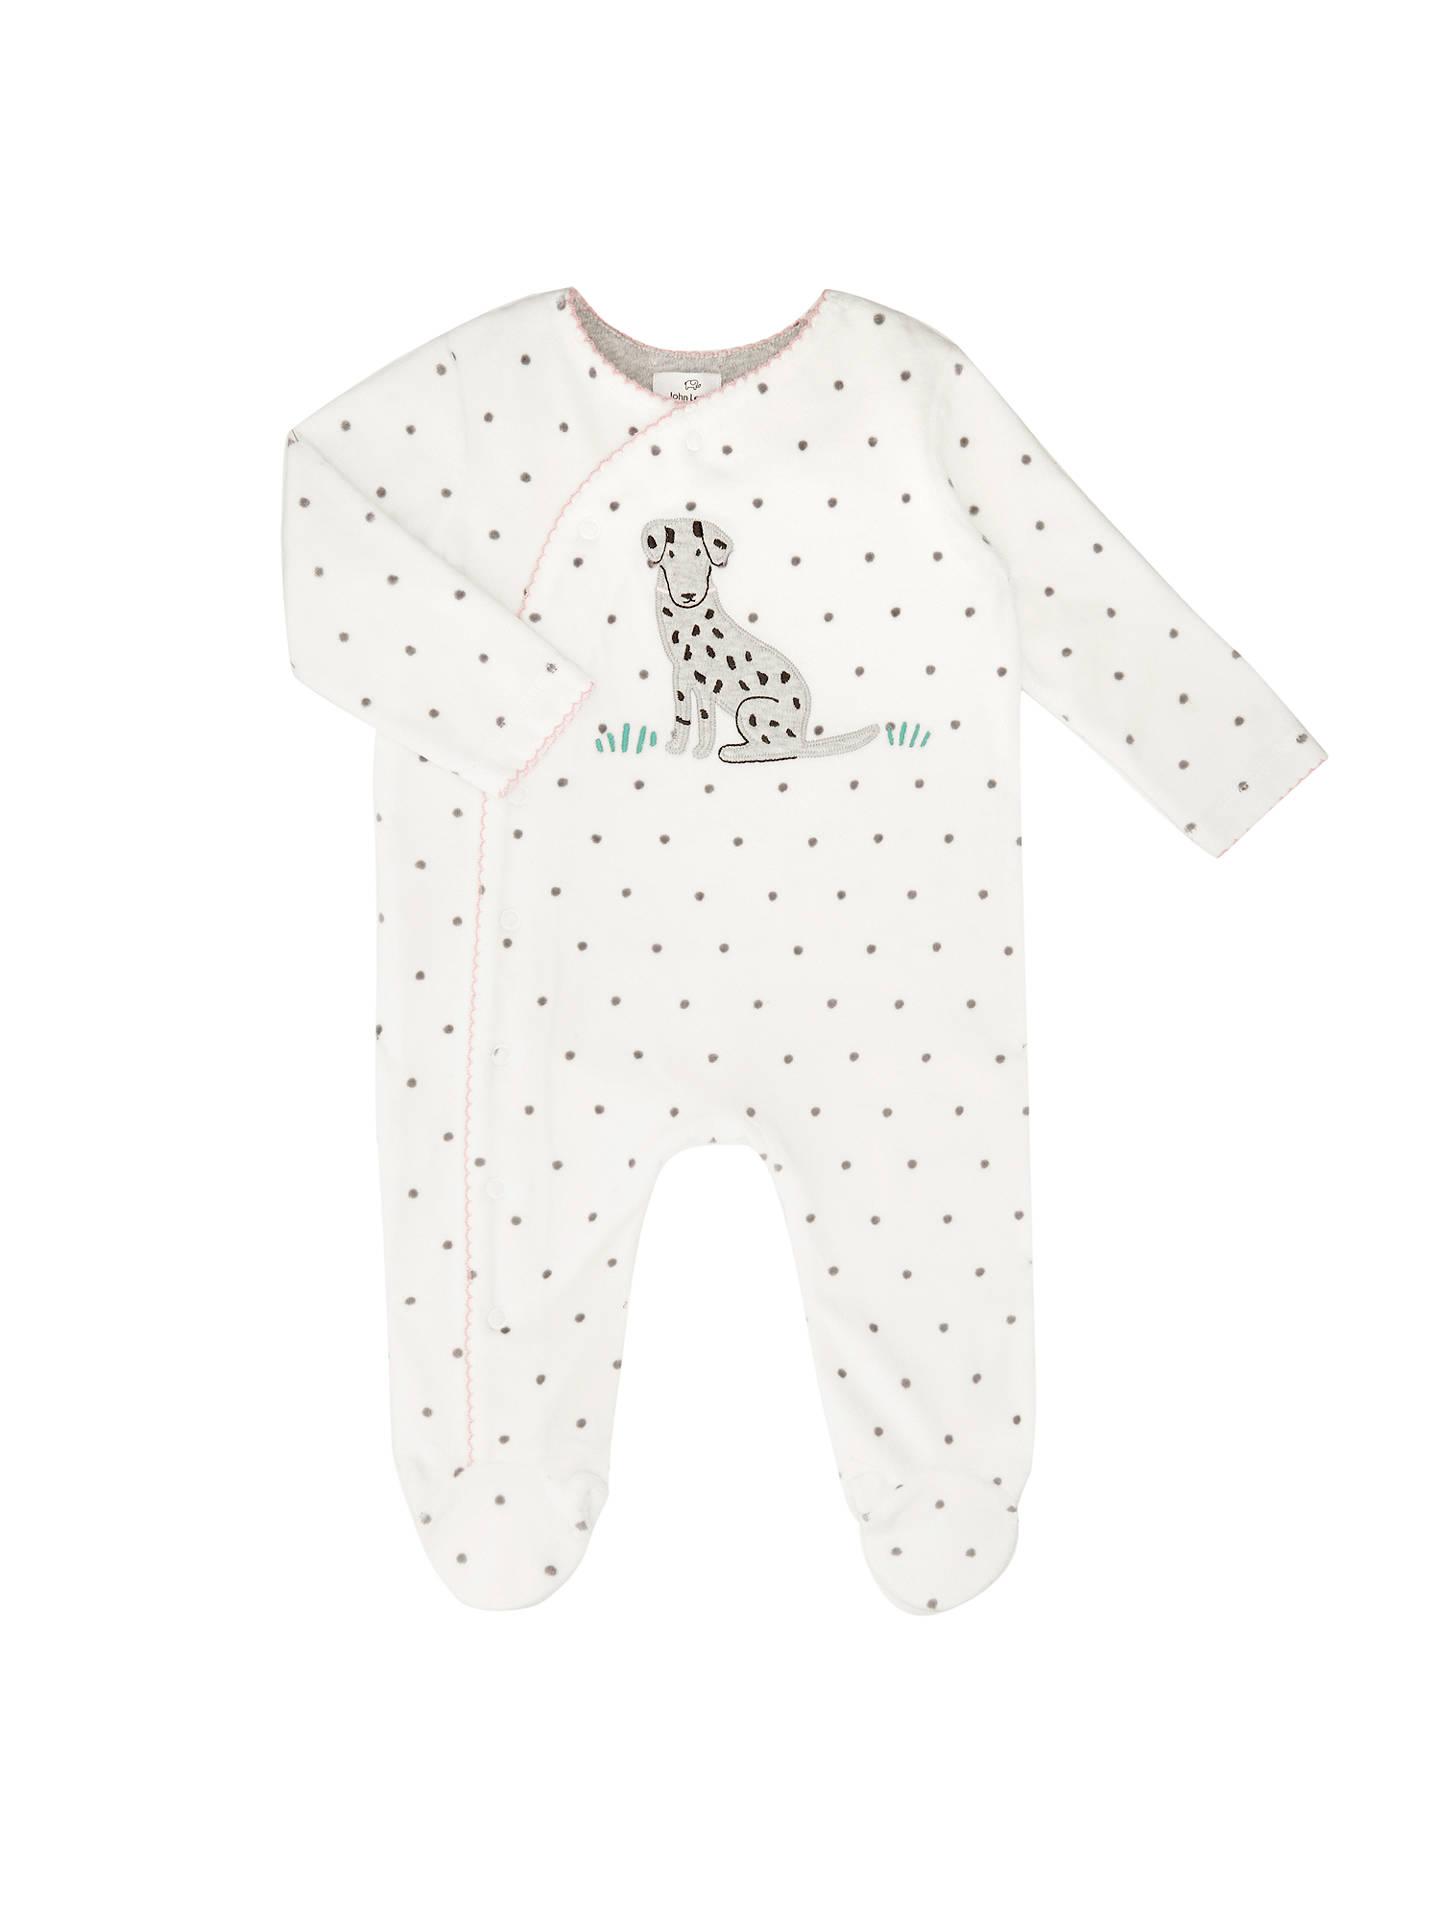 017d1a3363e0 John Lewis Baby Velour Dalmatian Sleepsuit